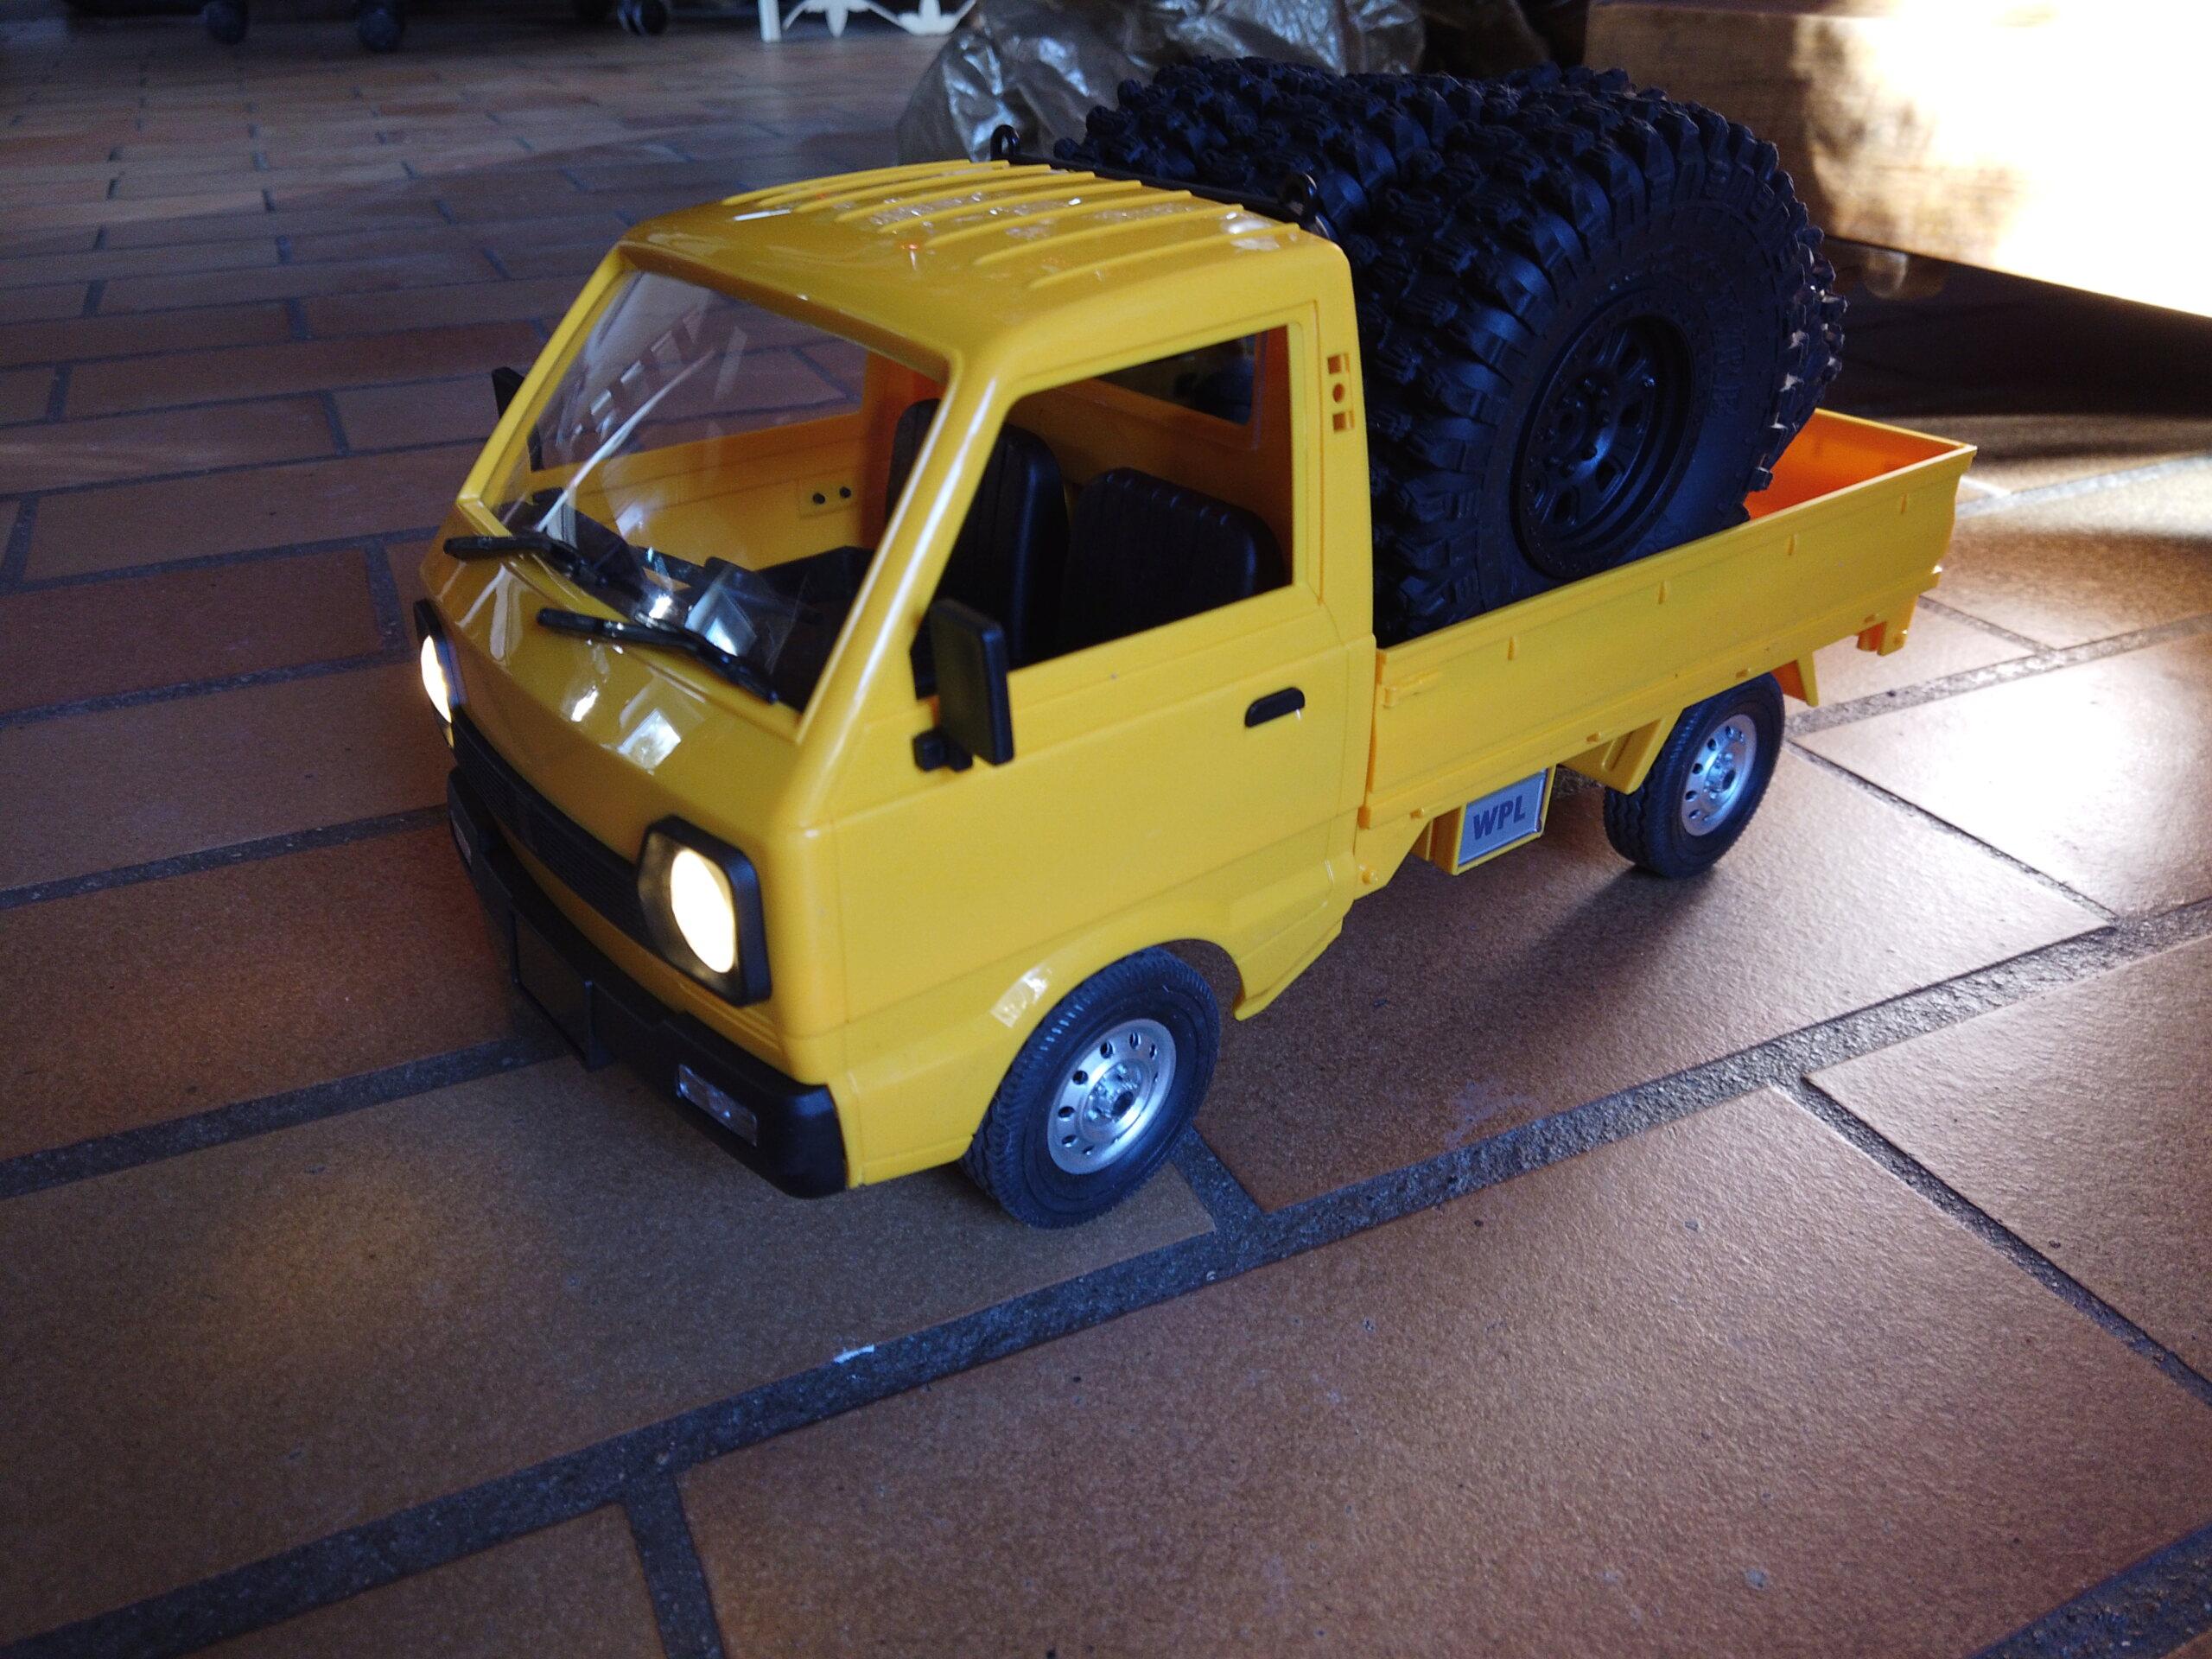 Un énorme camion de plus, le WPL D12 Suzuki Carry 1/10... Dji_0111